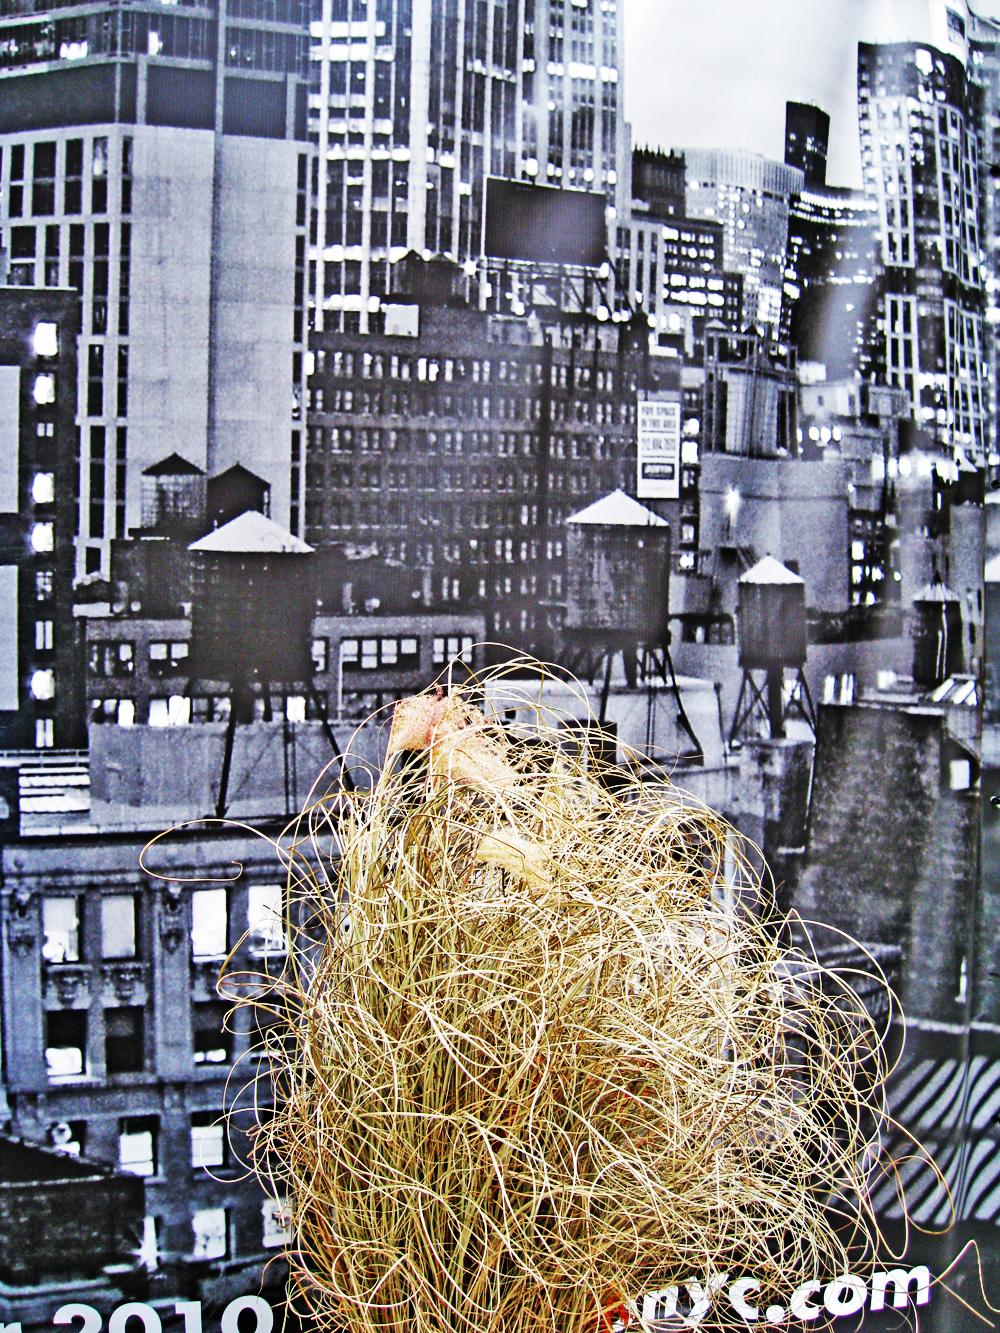 """Untitled"" by Ira Joel Haber"